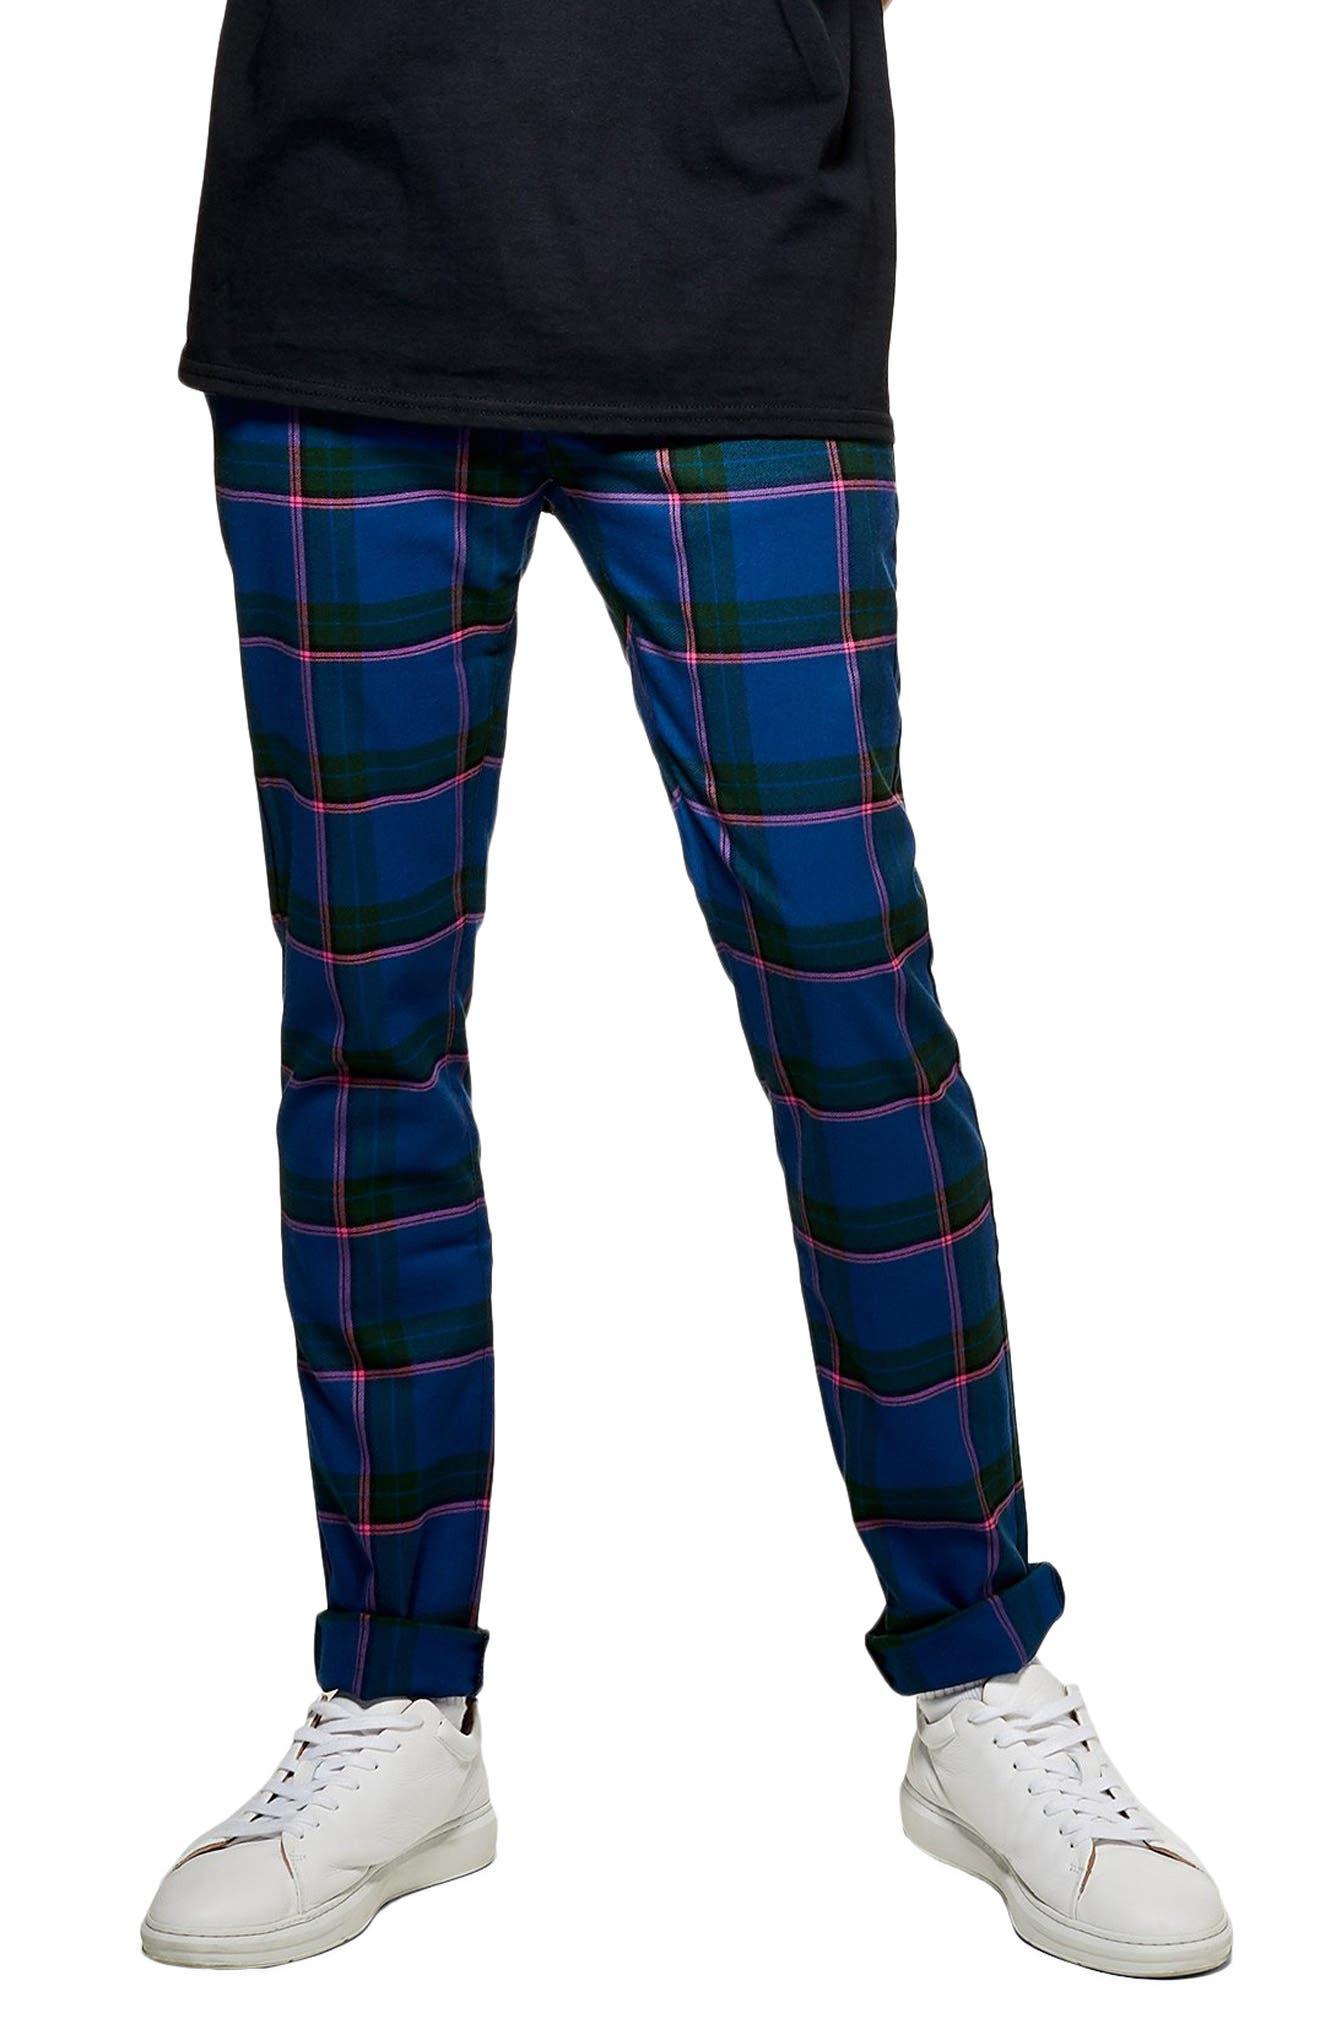 Mitchell Check Print Skinny Pants,                             Main thumbnail 1, color,                             BLUE MULTI